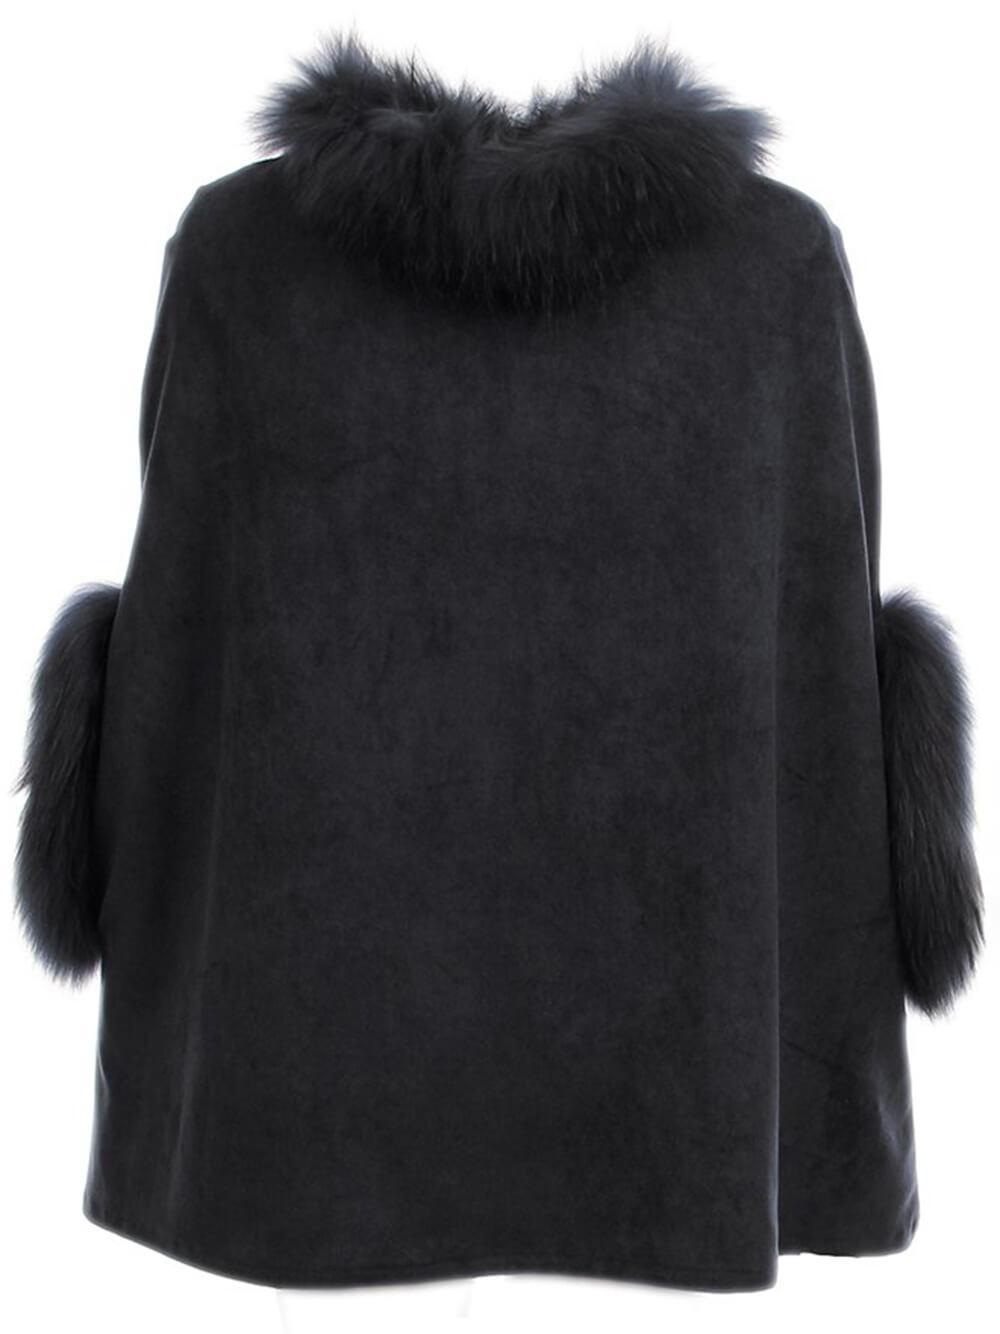 Faux Suede Cape With Fur Trim Item # 71737-F21